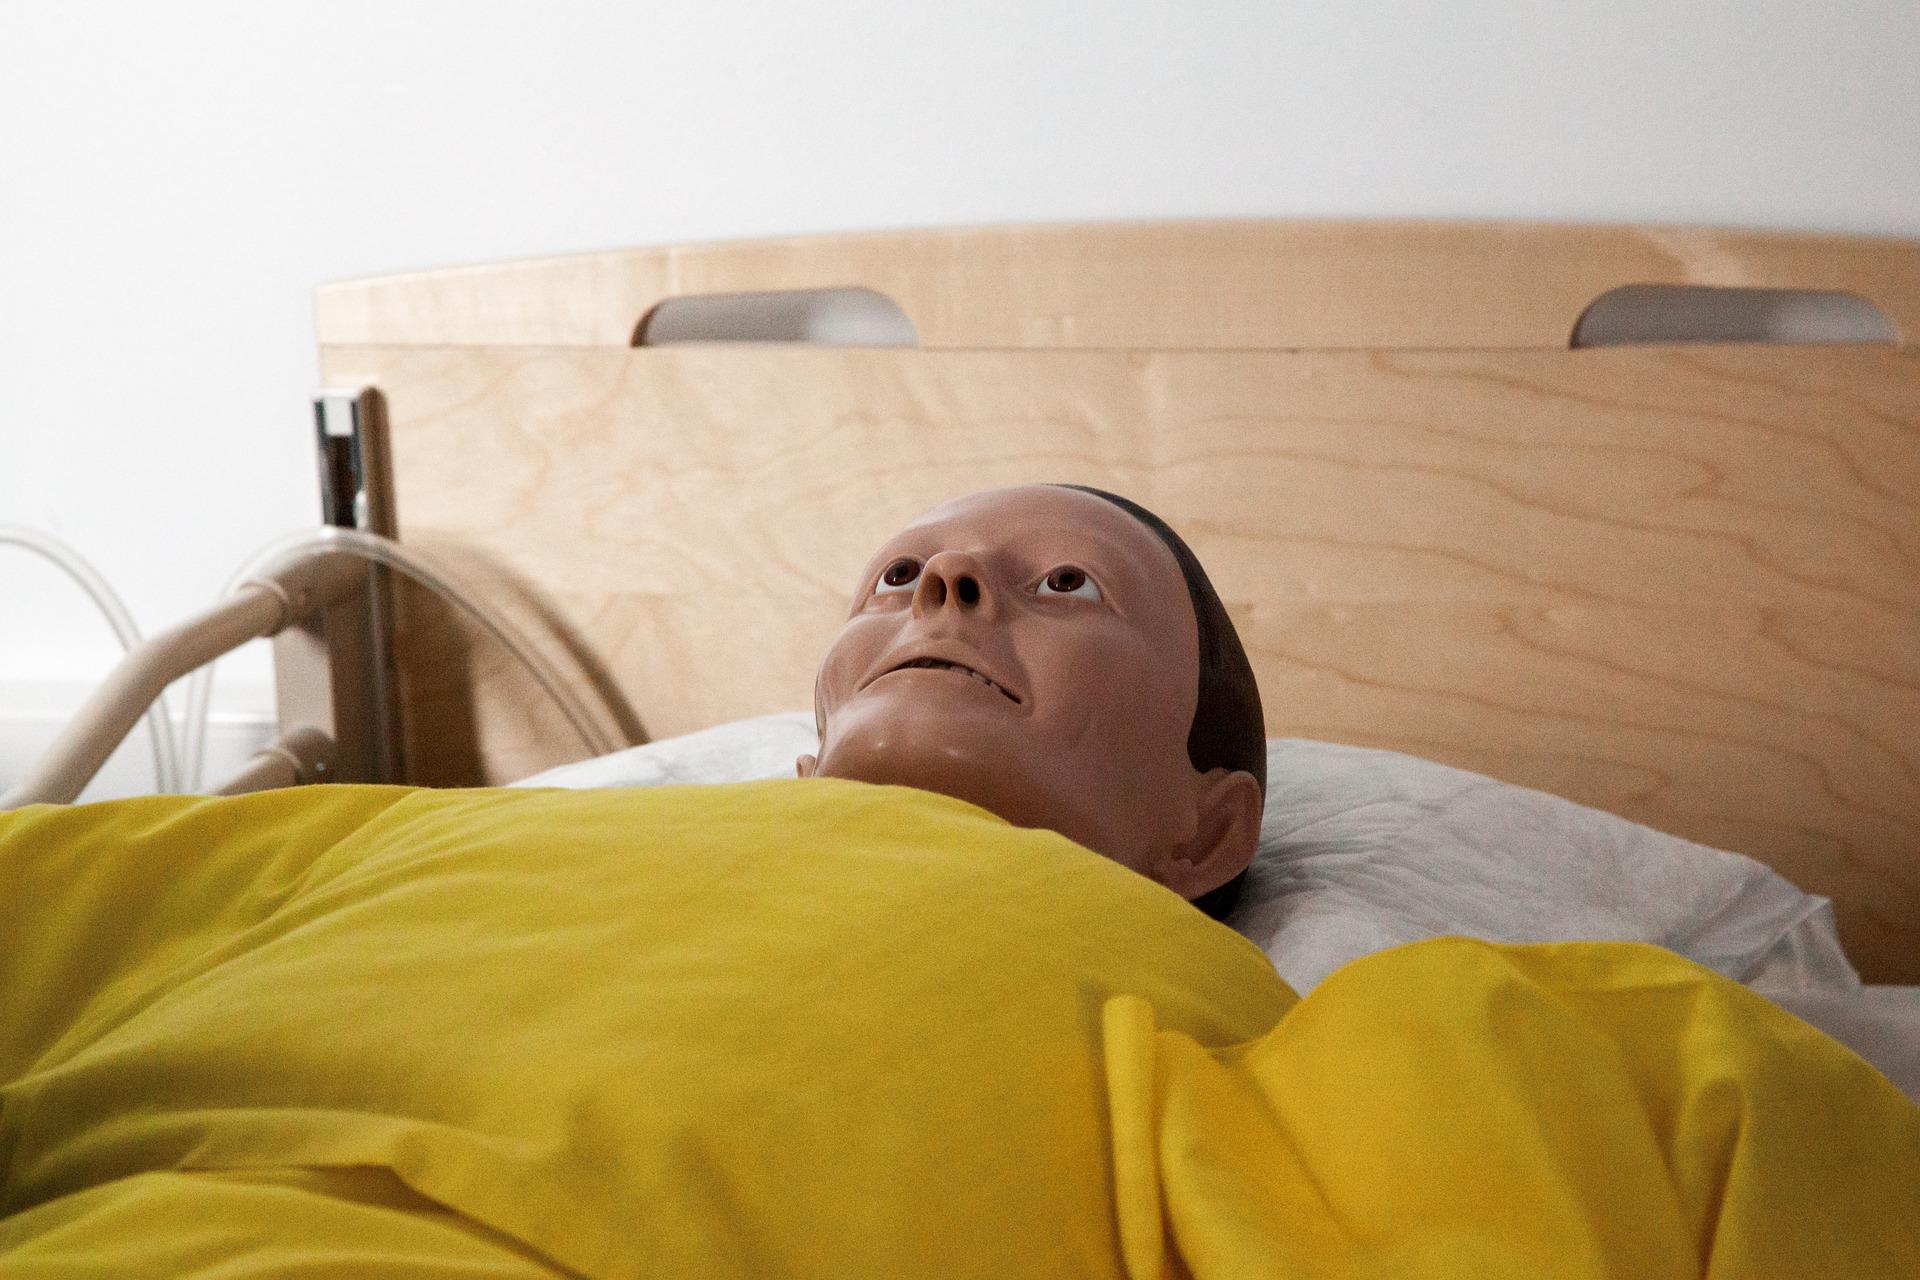 paramedics-doll-1142277_1920